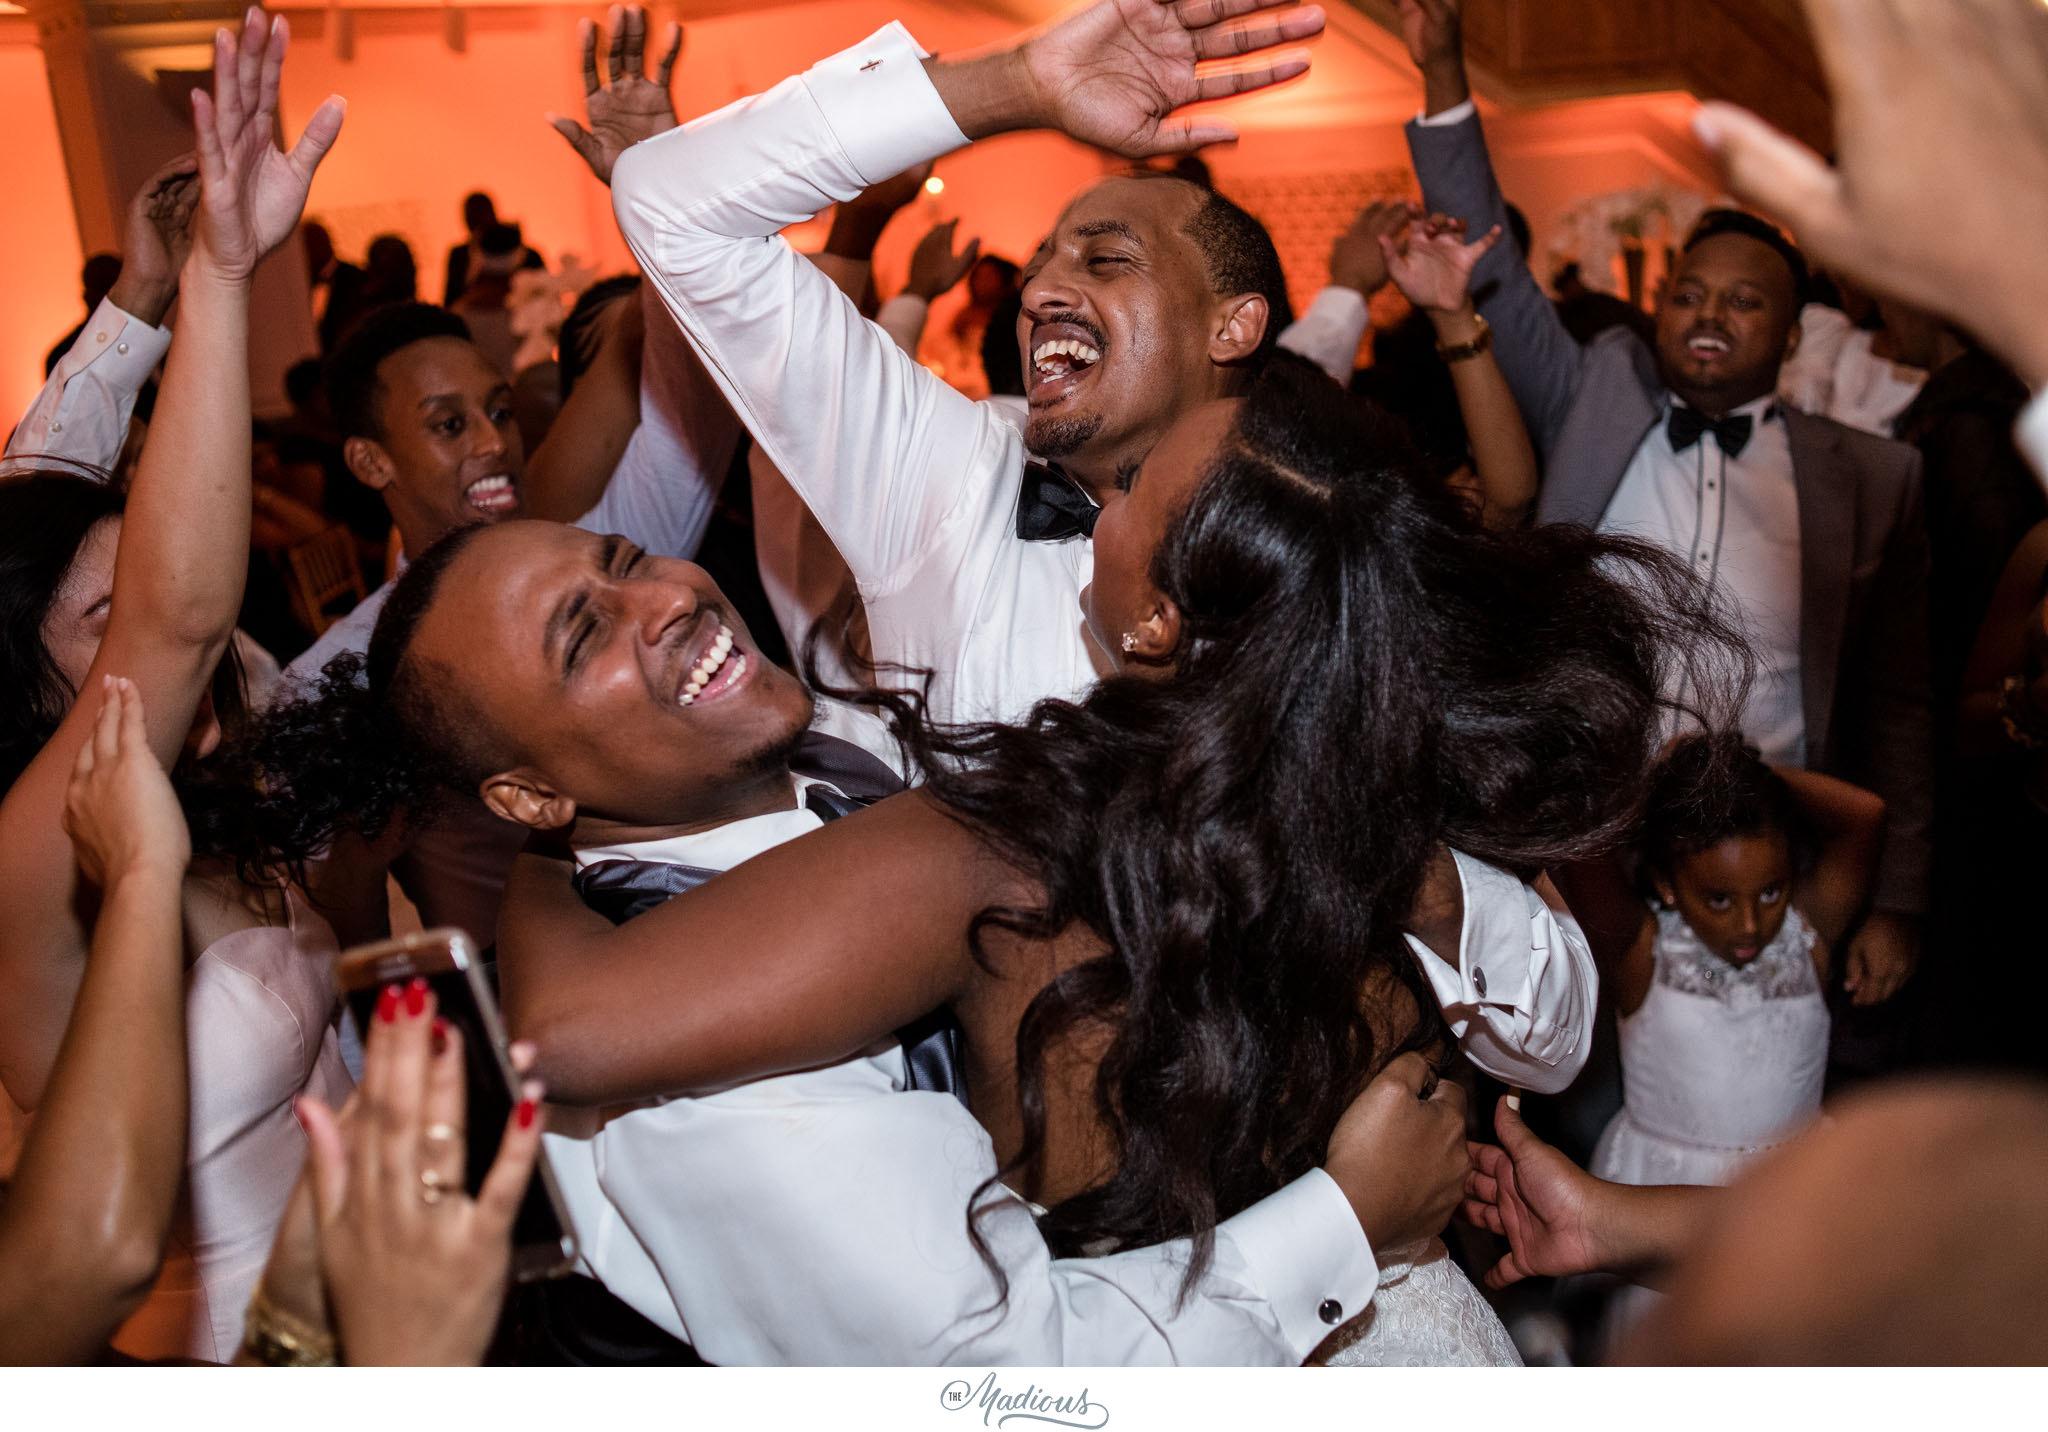 nmwa+wedding,+women+in+the+arts+wedding,+ethiopian+wedding,+dc+wedding+0241.jpg